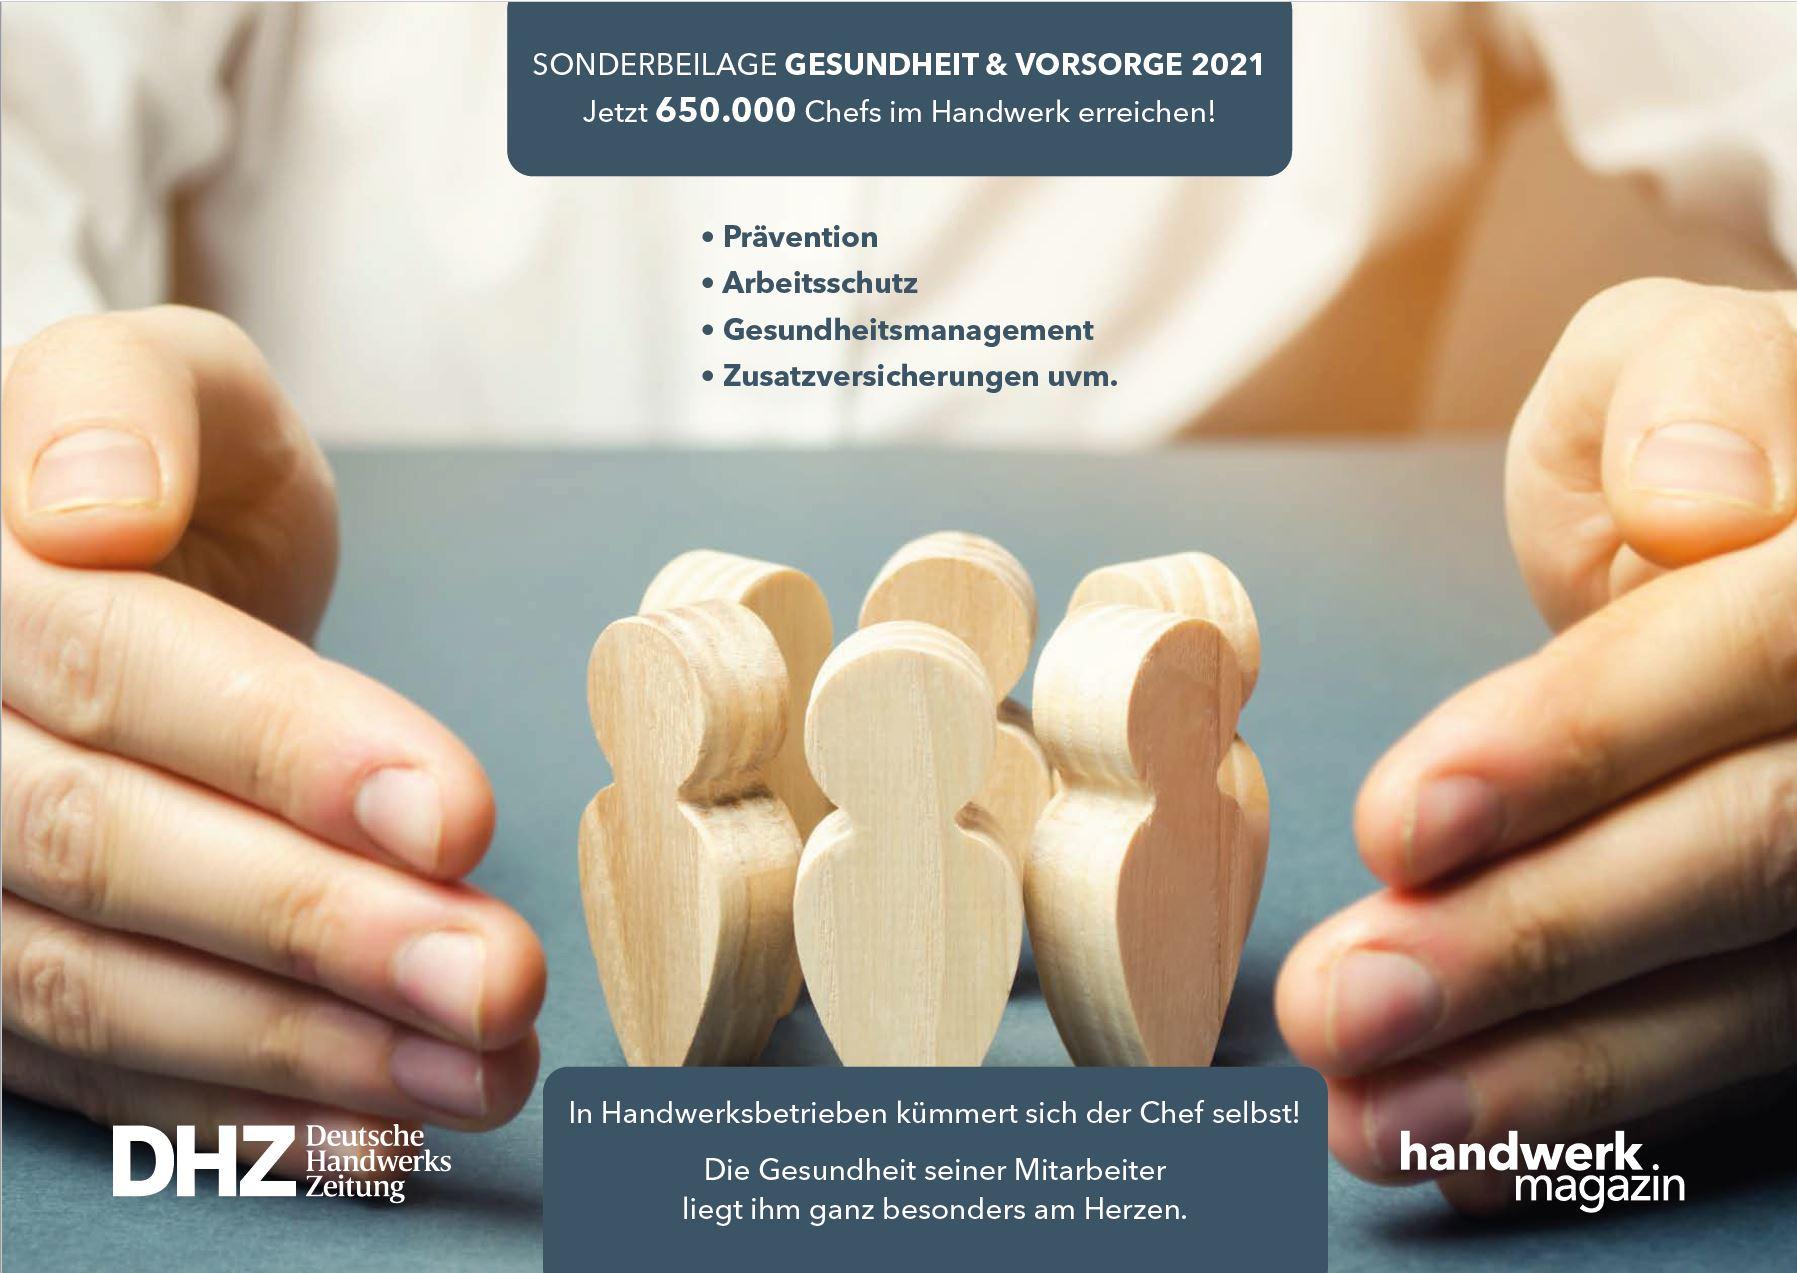 Sonderbeilage_Gesundheit-Vorsorge_2021